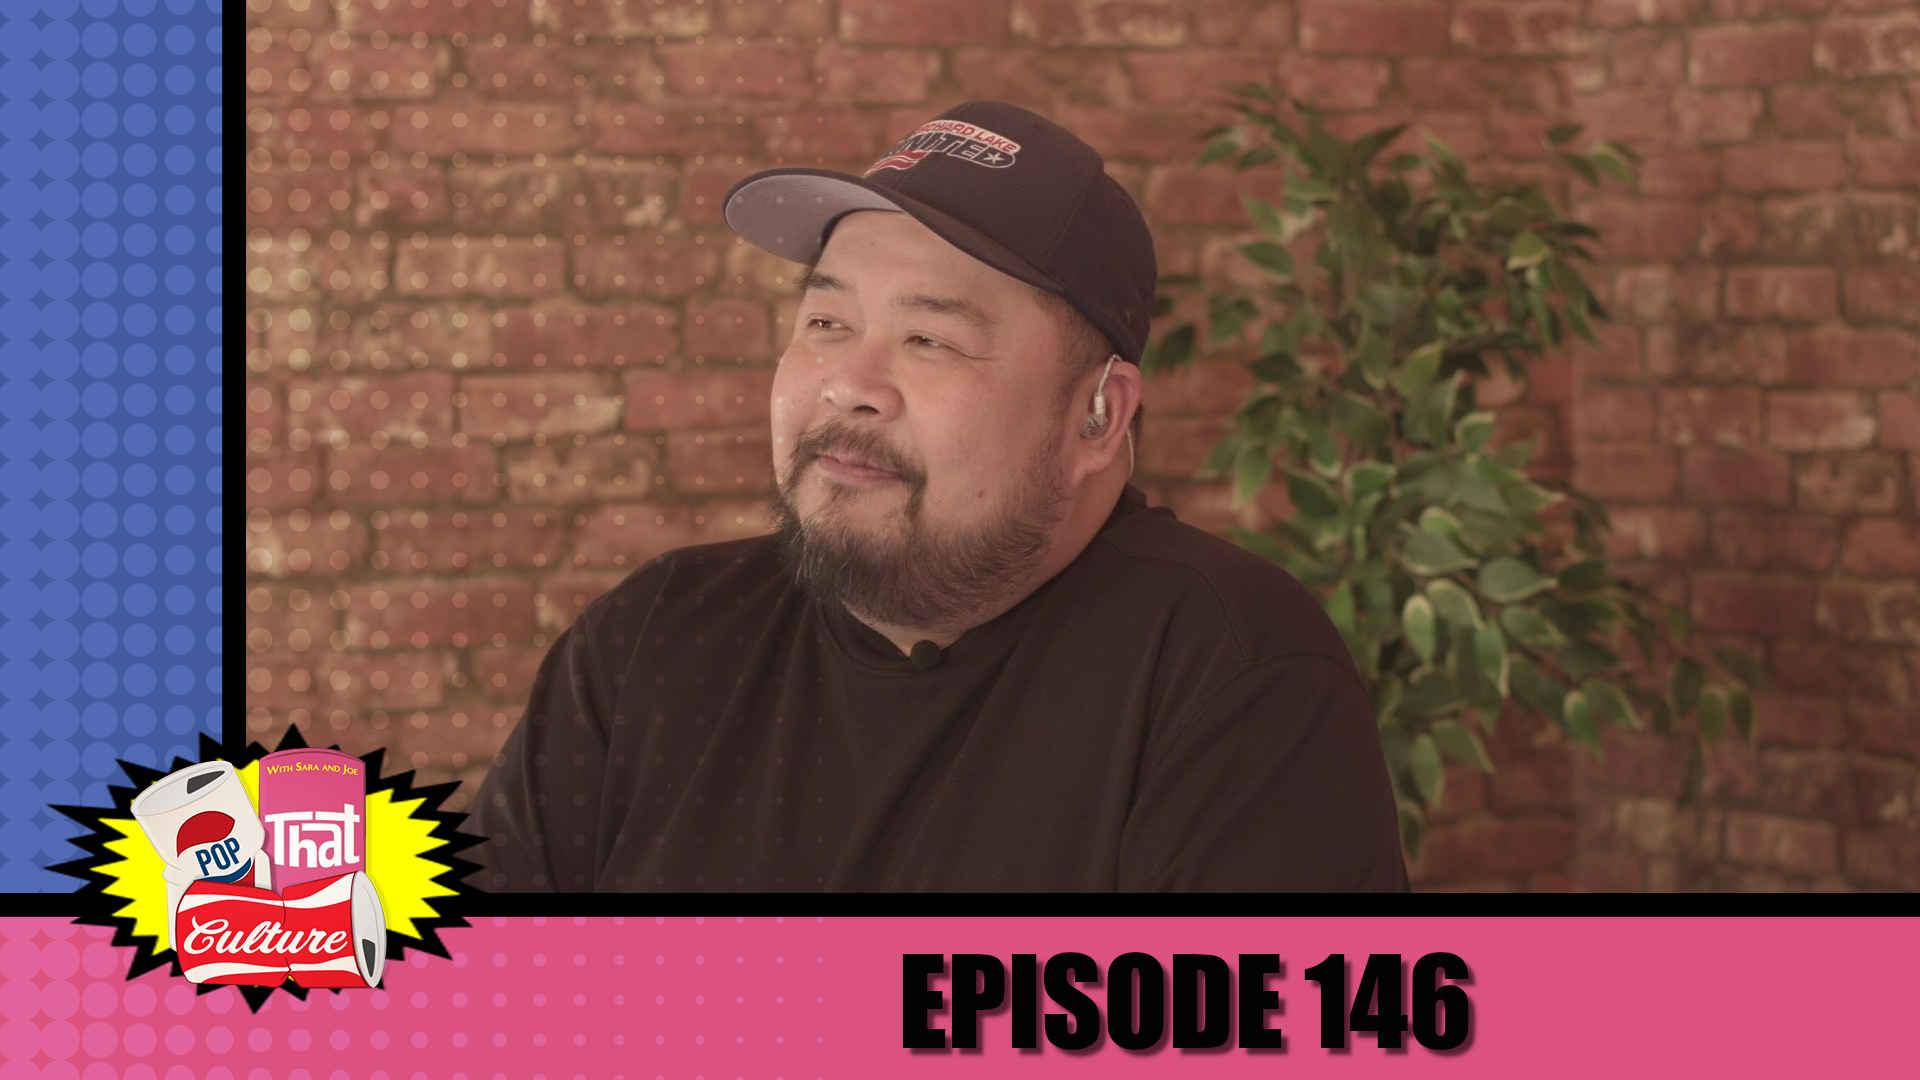 Pop That Culture - Episode 146